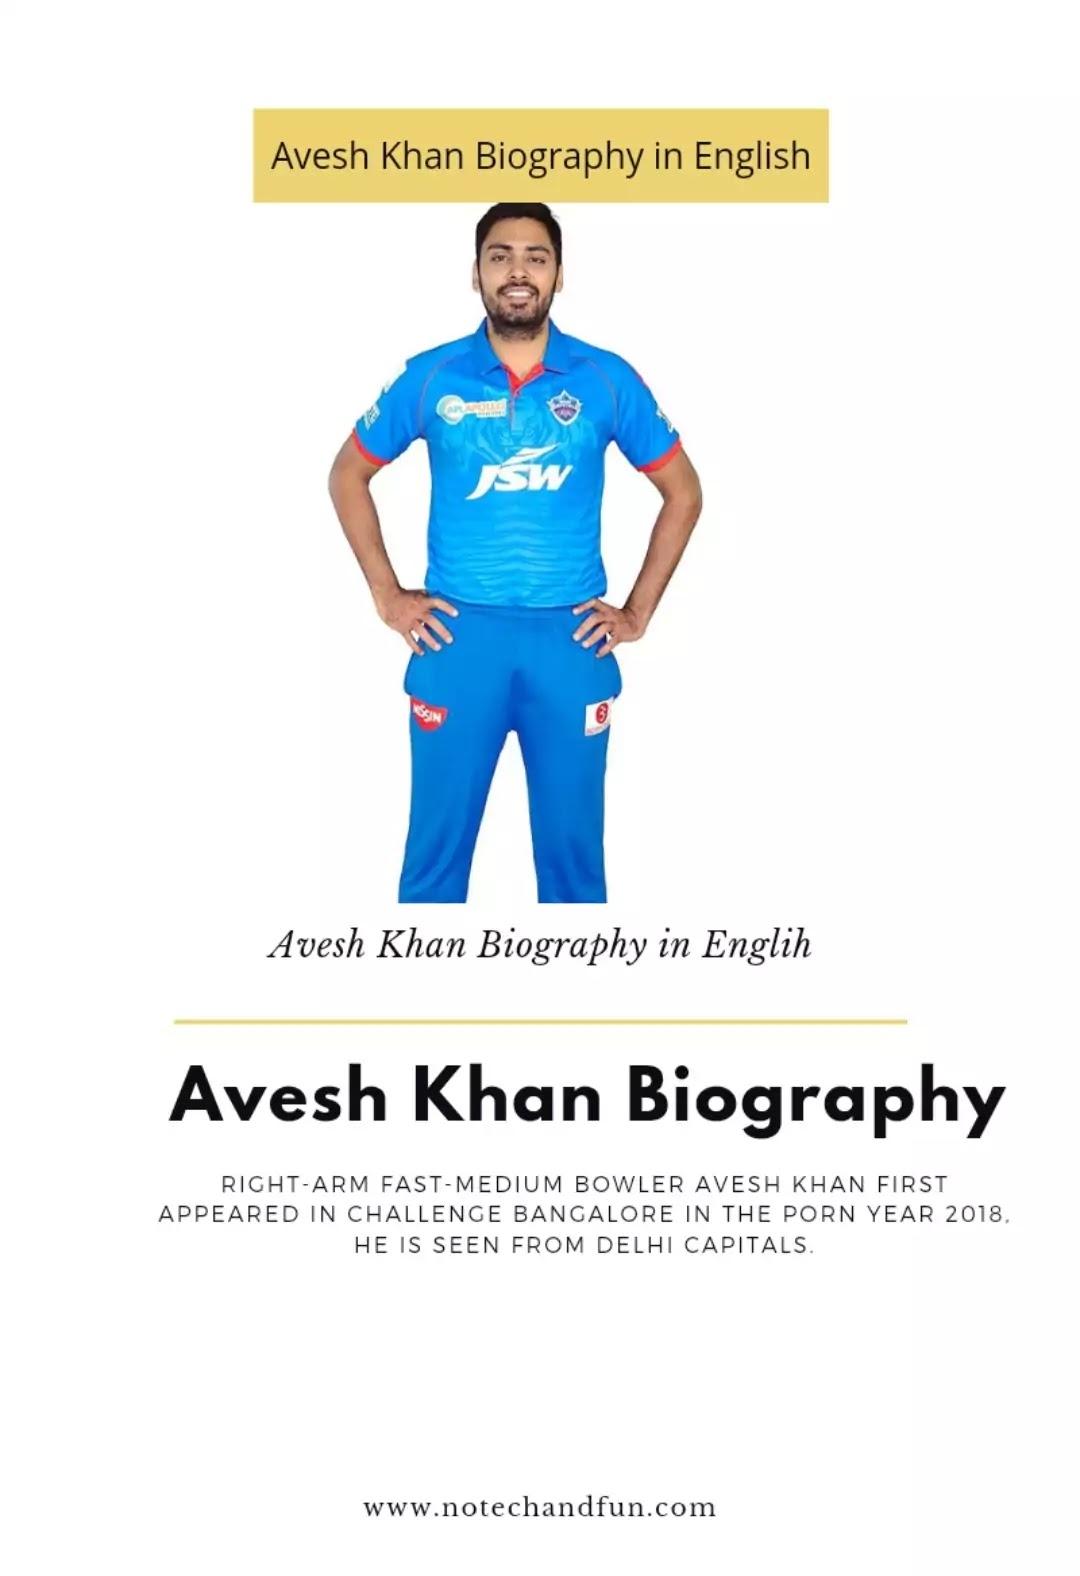 Avesh Khan Biography